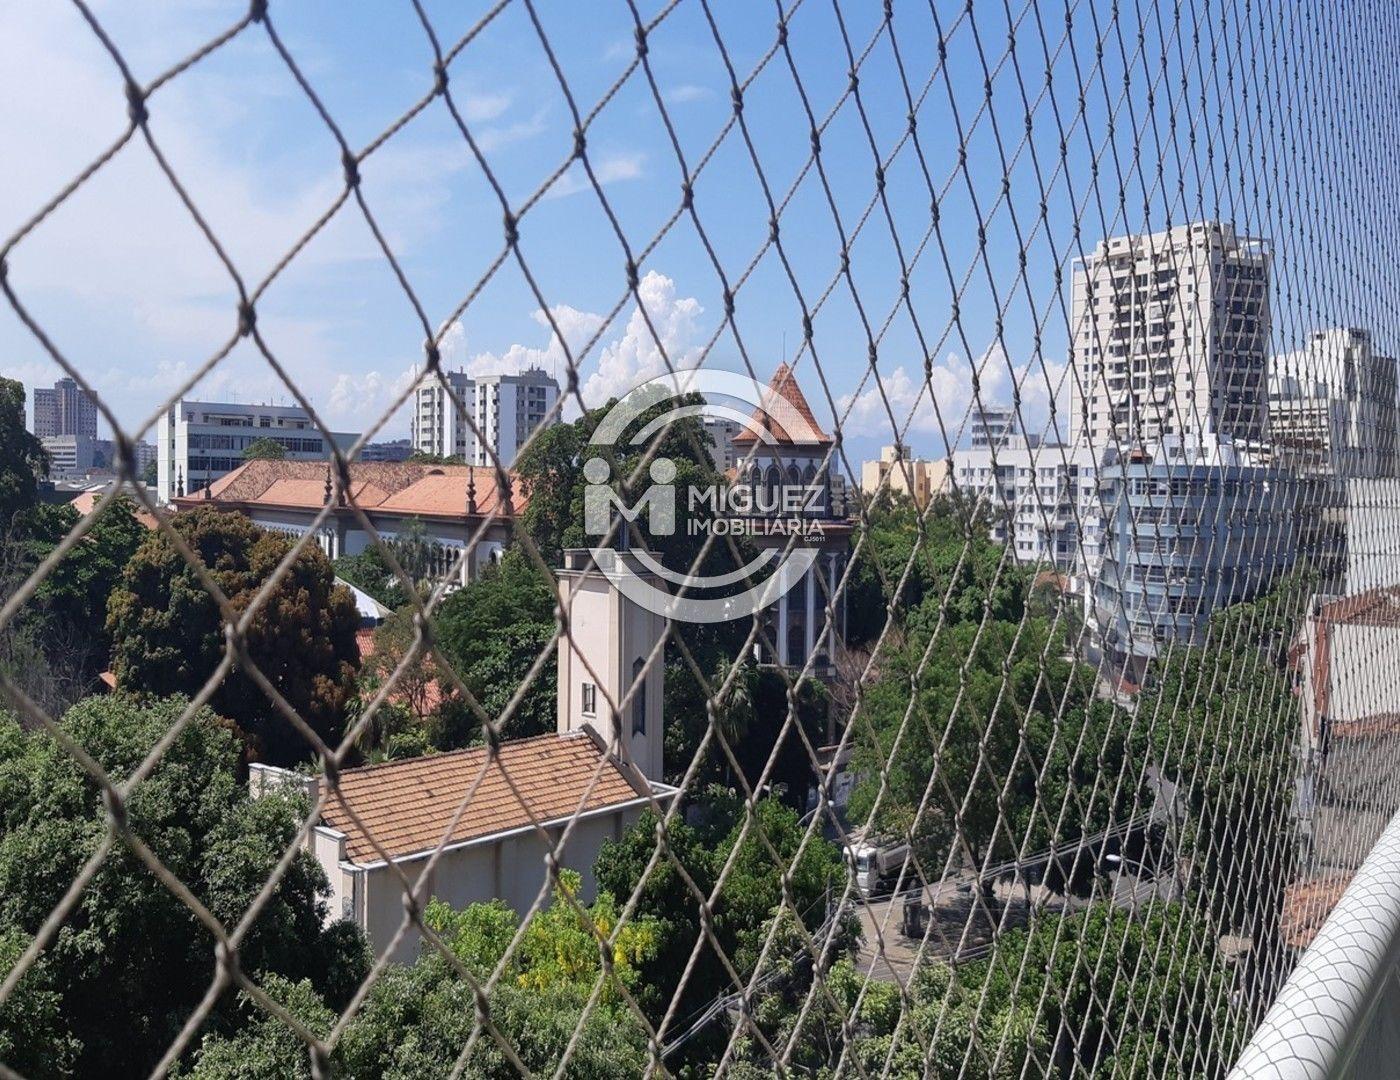 Apartamento, aluguel, Rua Gonçalves Crespo - Tijuca , Rio de janeiro